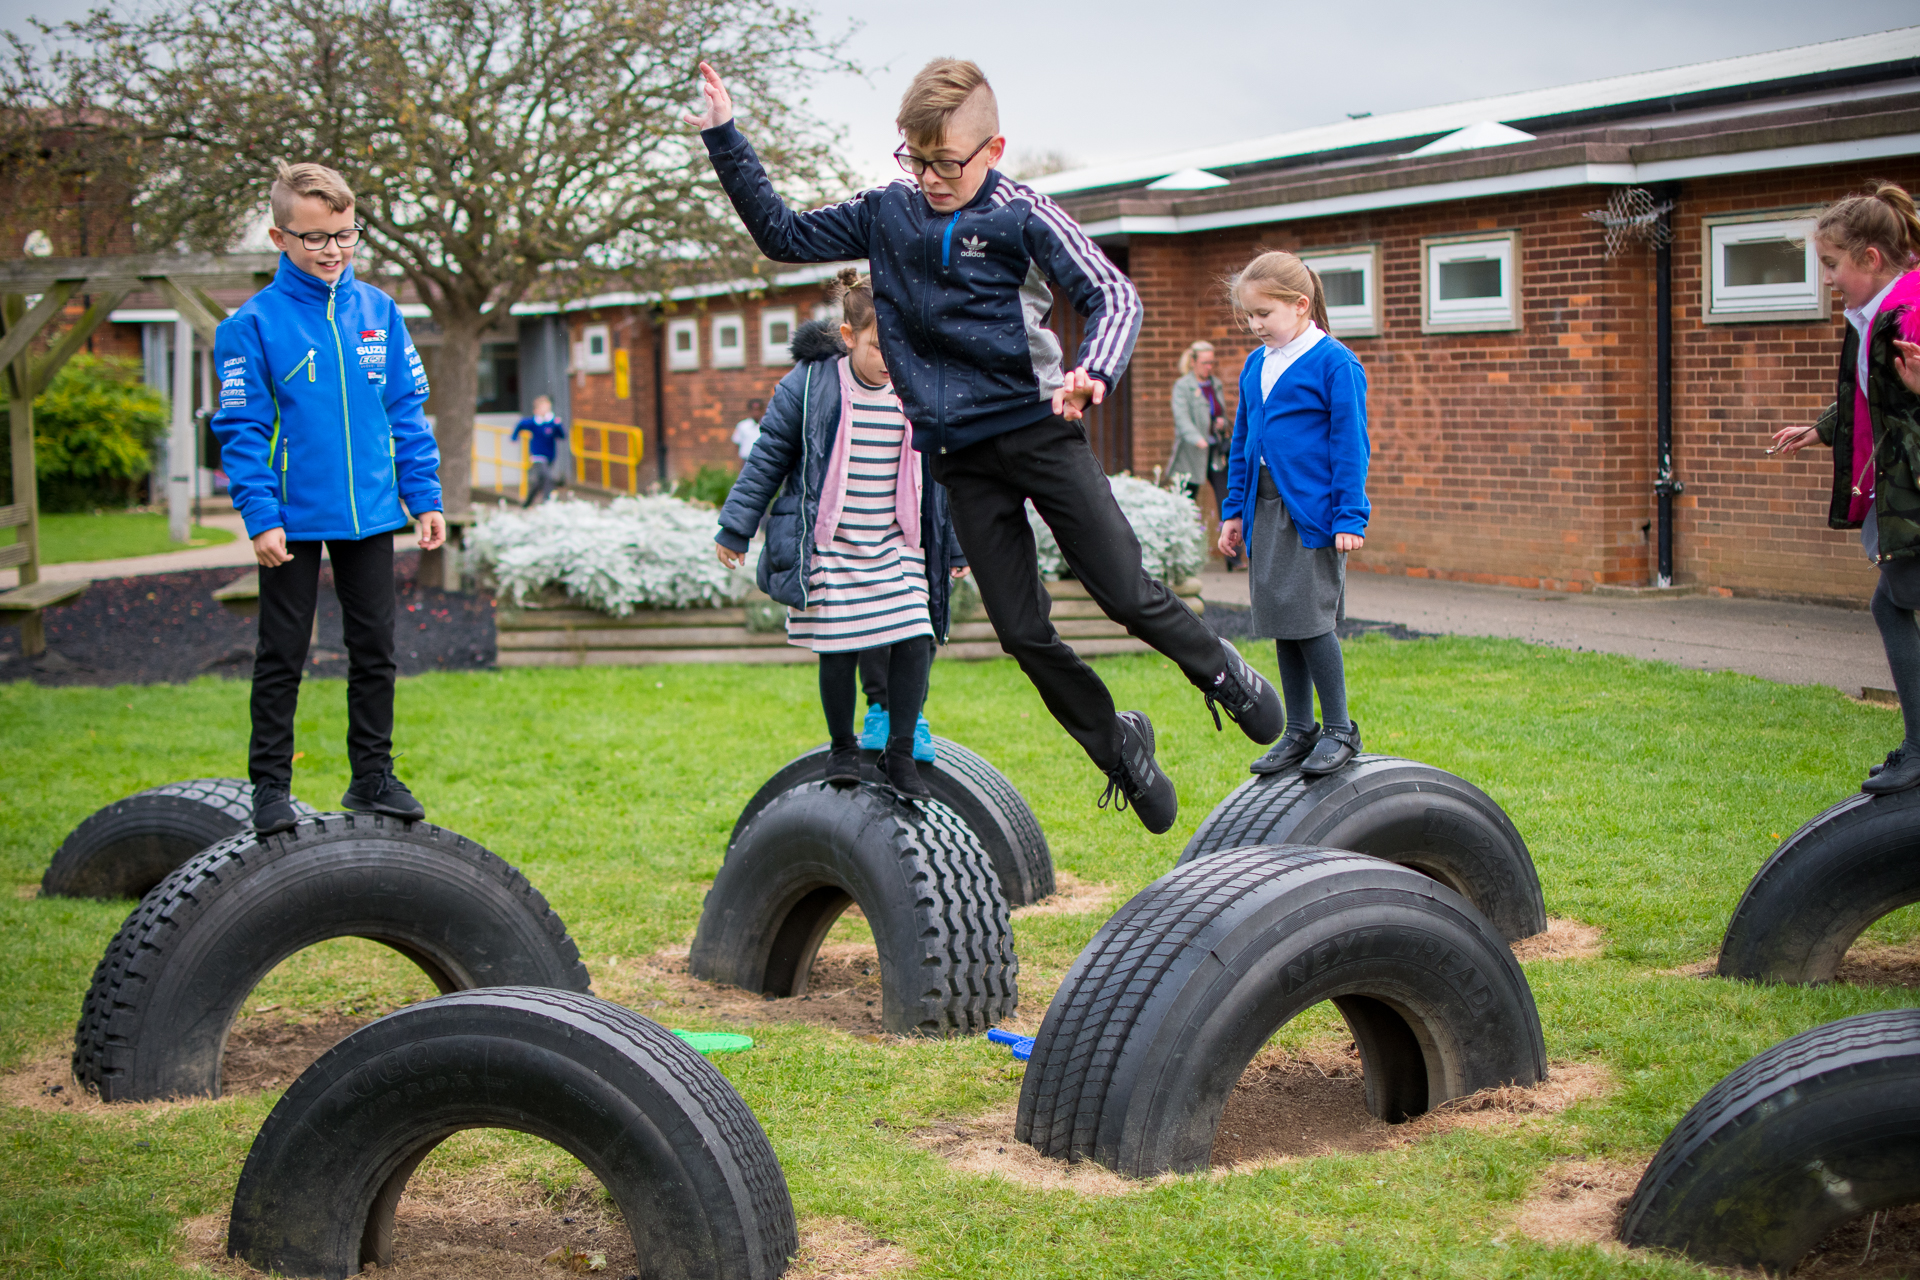 73fc5612d1 Term Dates | Mountbatten Primary School - Hull